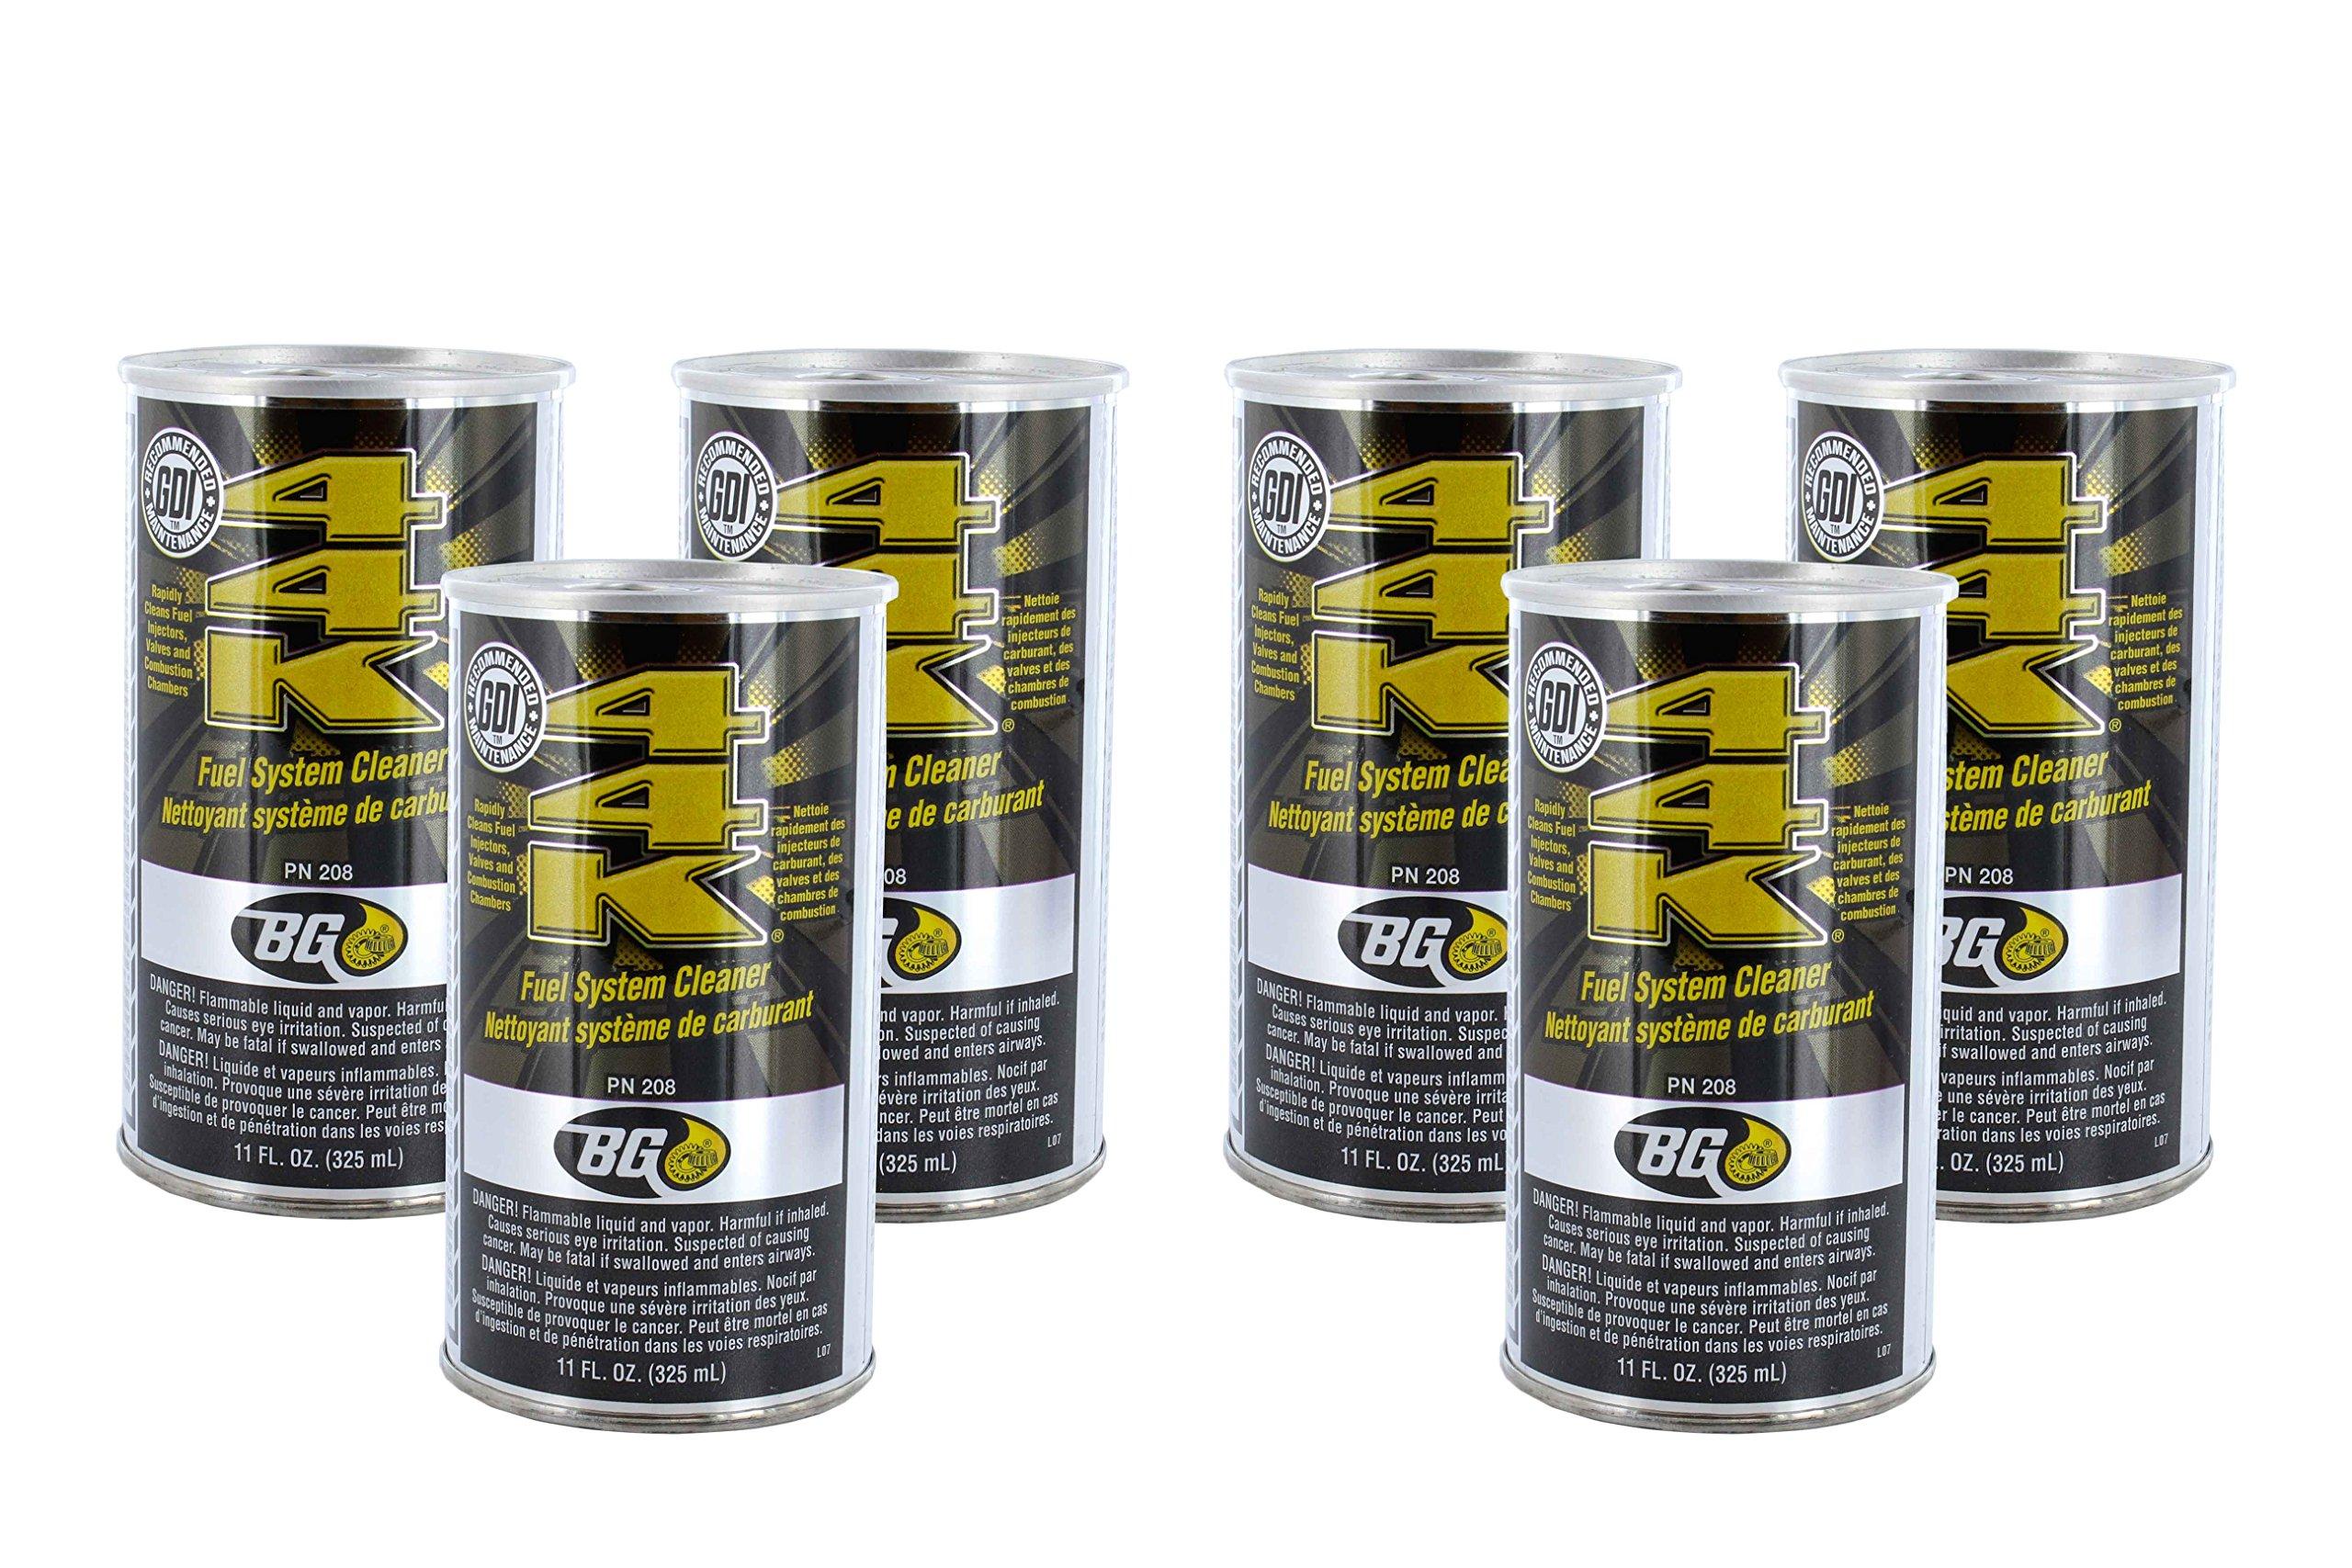 BG 44K Fuel System Cleaner Power Enhancer (QTY 6) 11oz cans by BG